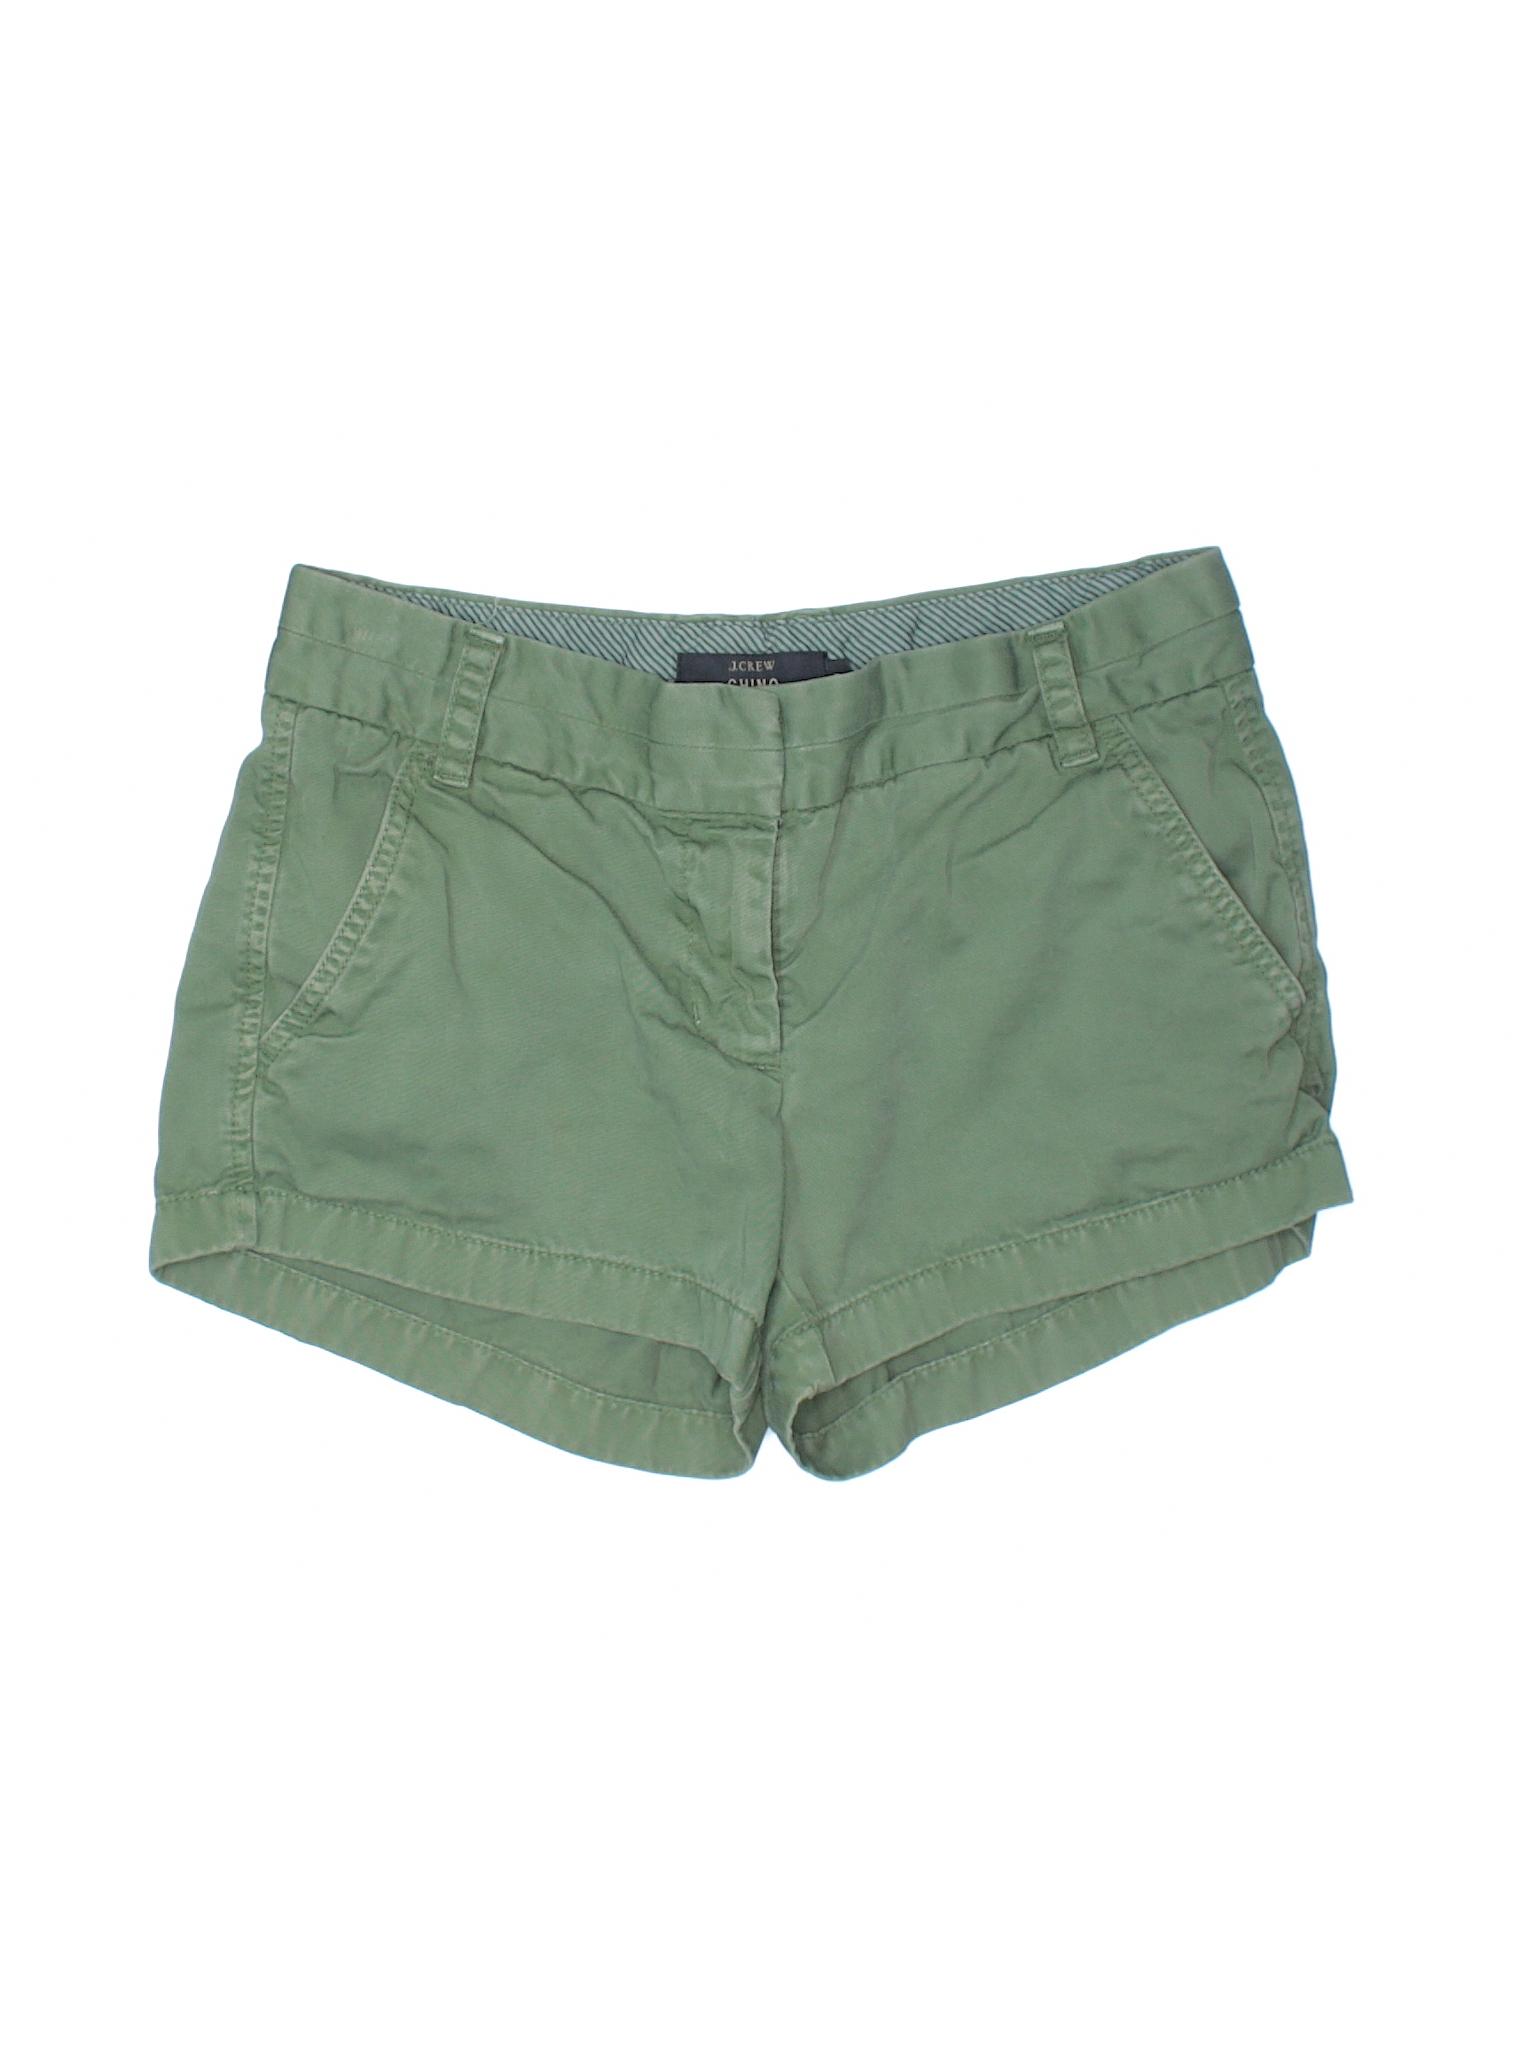 Boutique Boutique J J Khaki Khaki Crew Boutique Shorts J Shorts Boutique Crew Khaki Crew Crew J Khaki Shorts X86Awfq6n